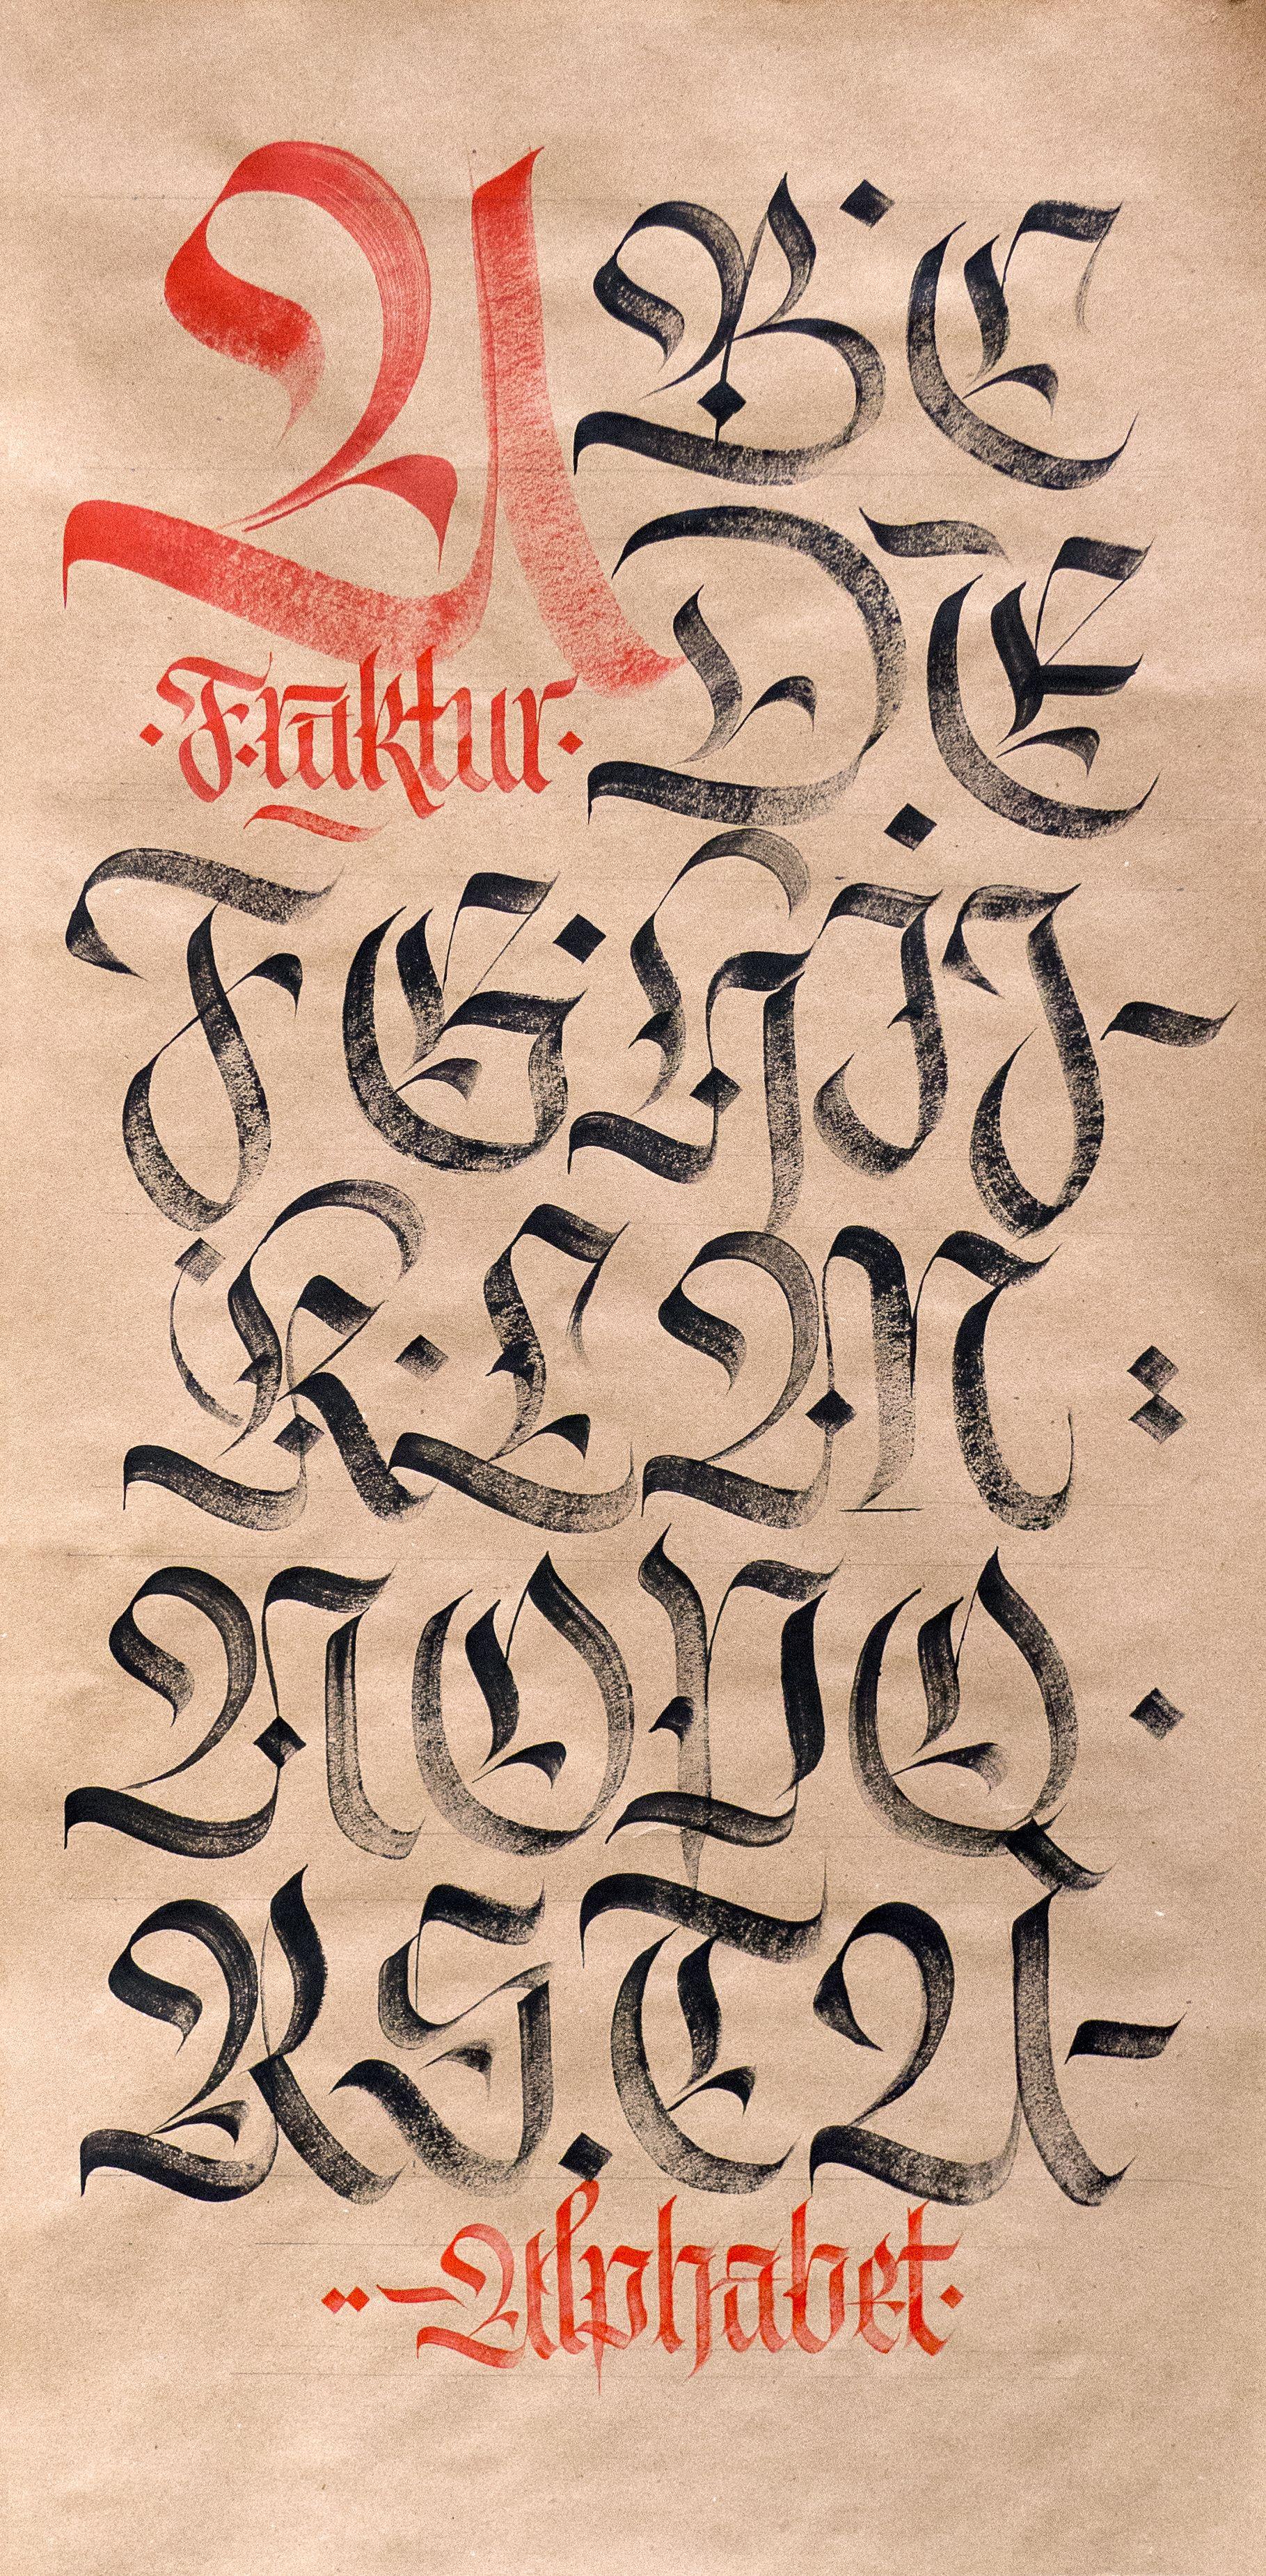 Calligraphy Letters Tag Alphabet Fraktur Capitals